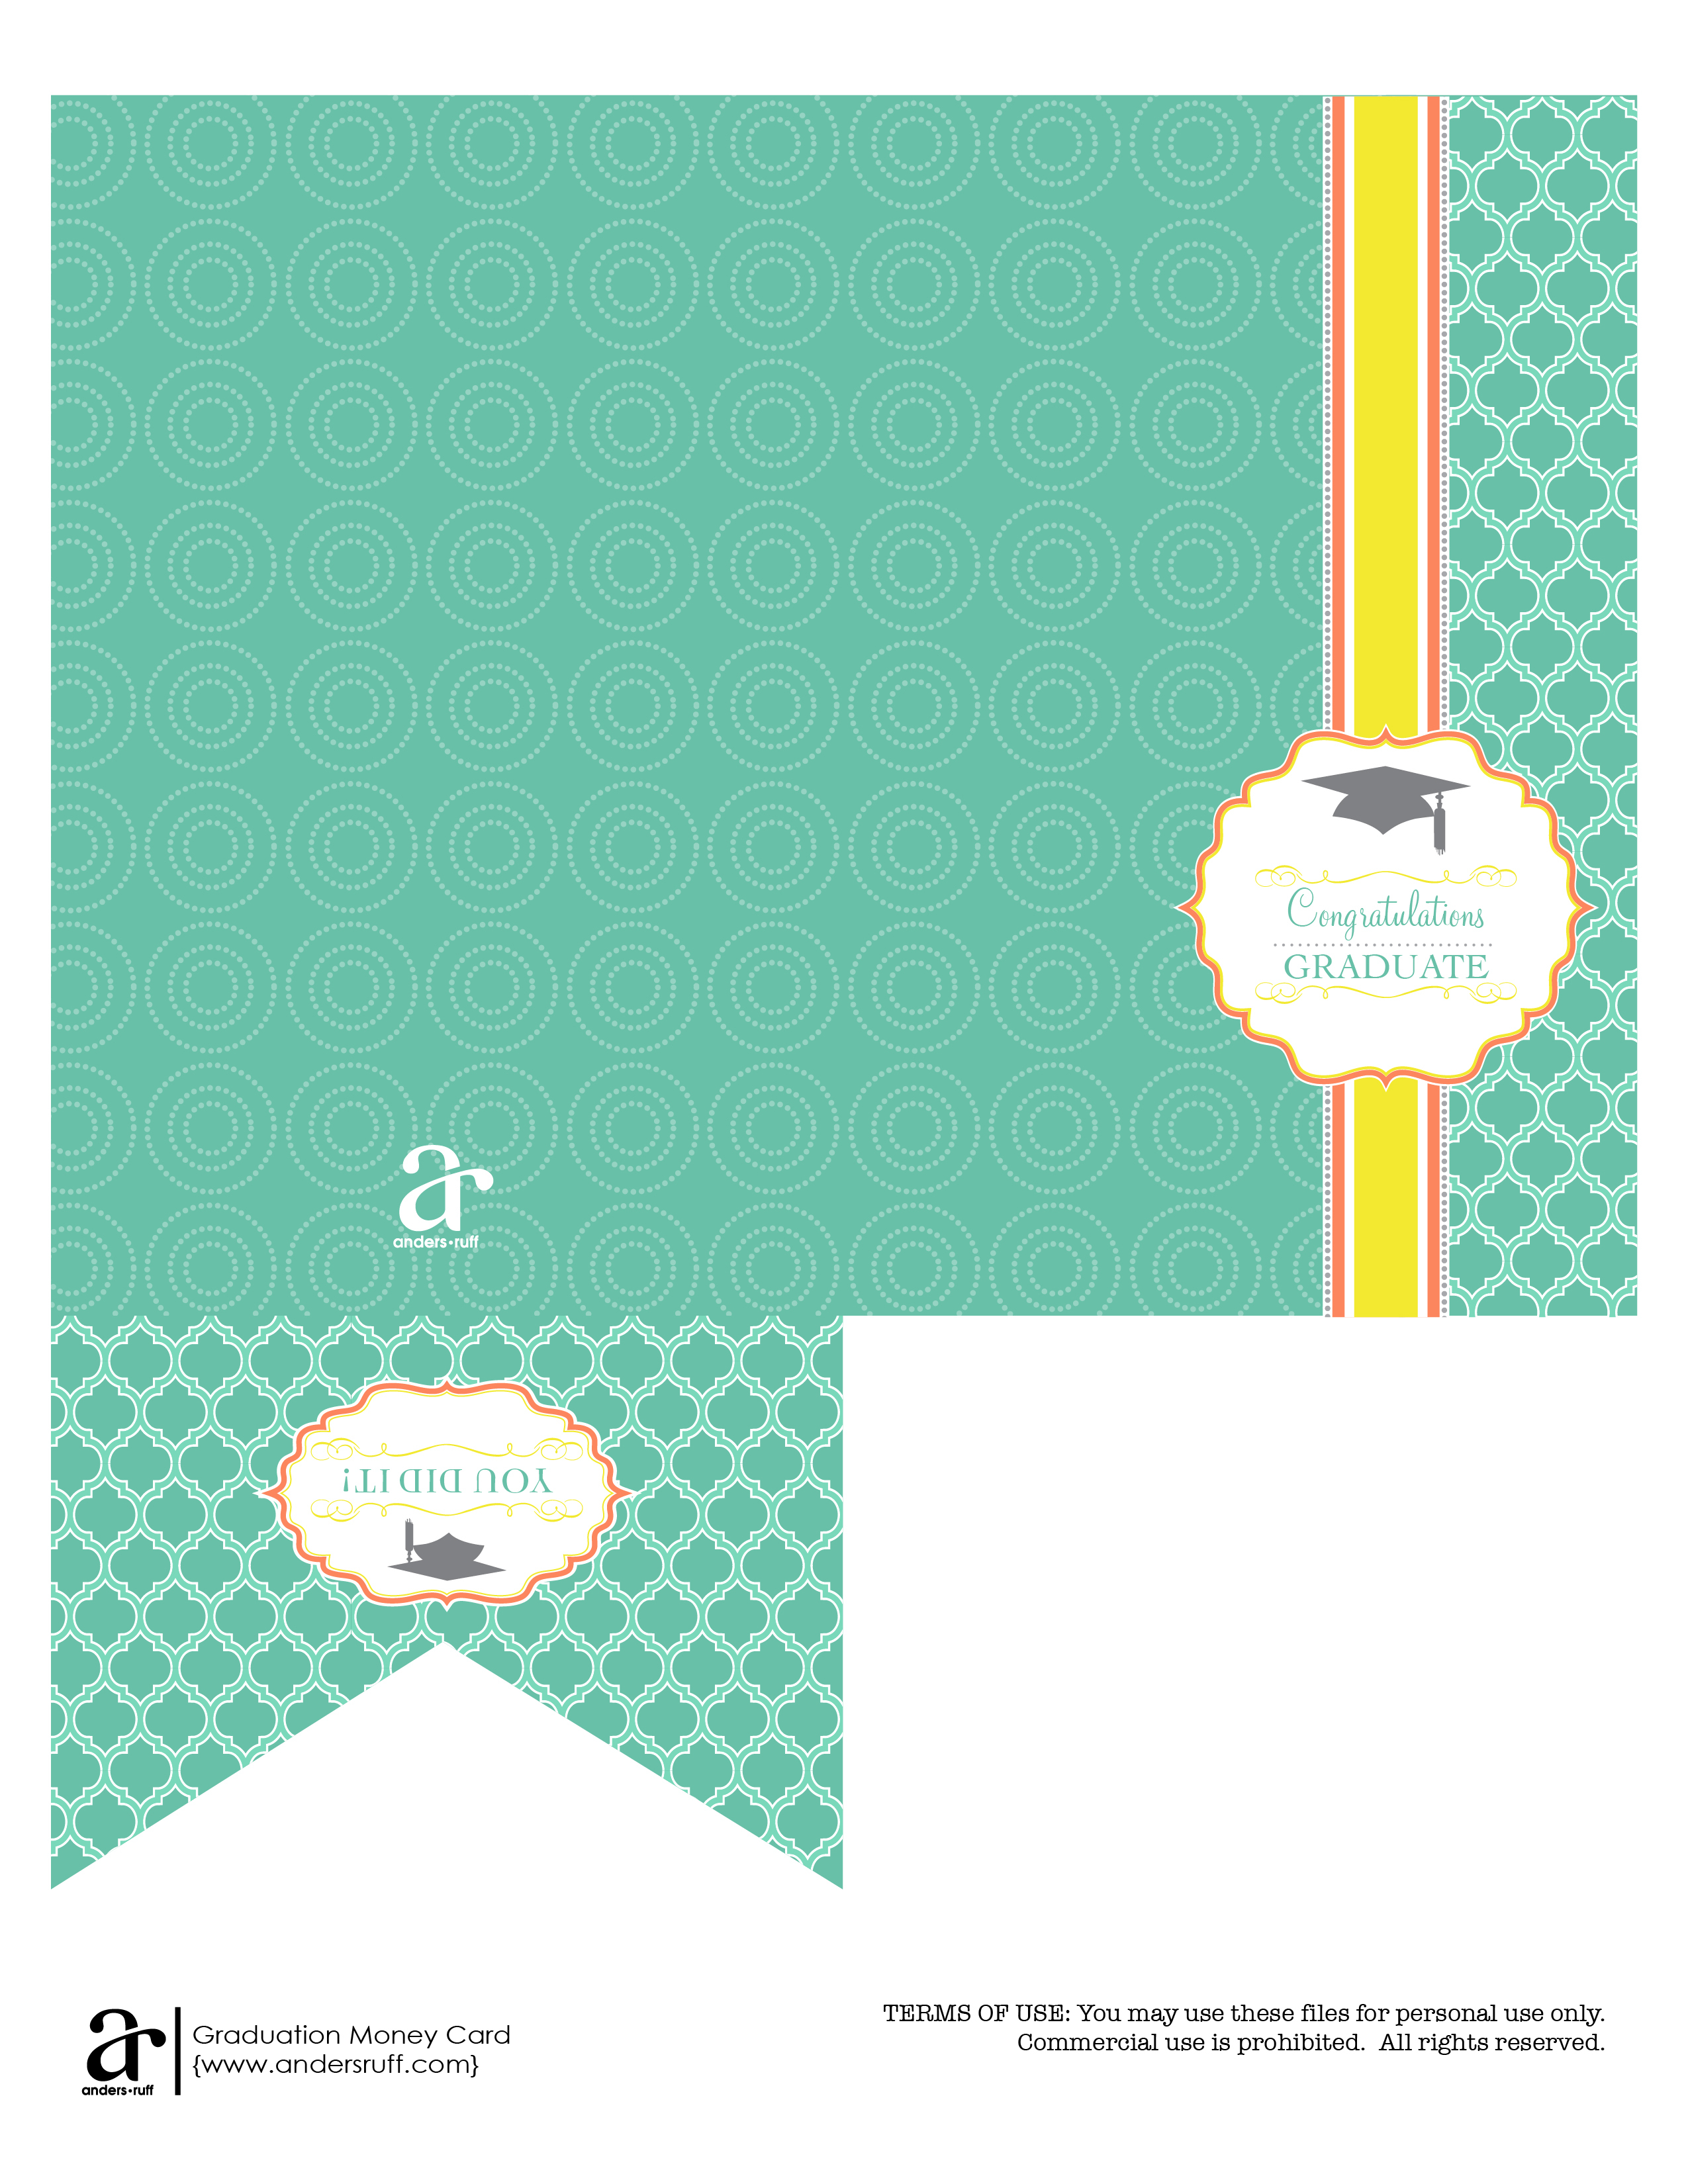 Ruff Draft: Free Printable Graduation Money Card - Anders Ruff - Free Printable Graduation Cards